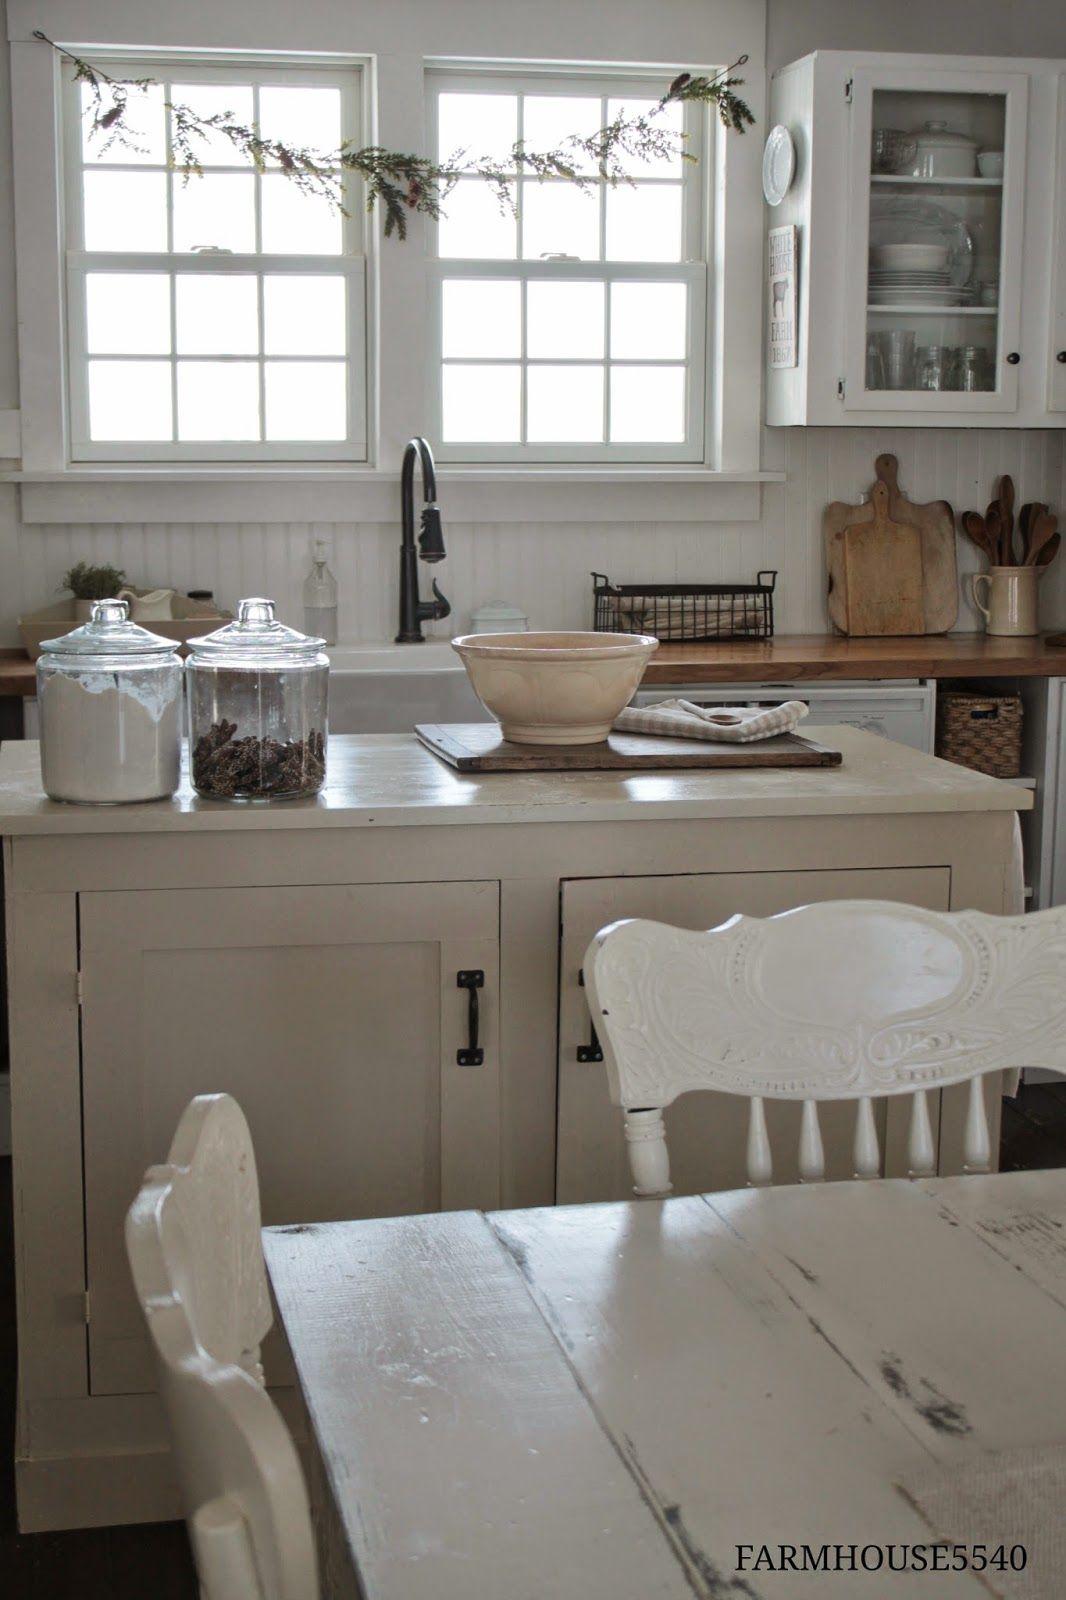 farmhouse 5540 in the kitchen pinterest k che keramik lampen und haust r eingang. Black Bedroom Furniture Sets. Home Design Ideas